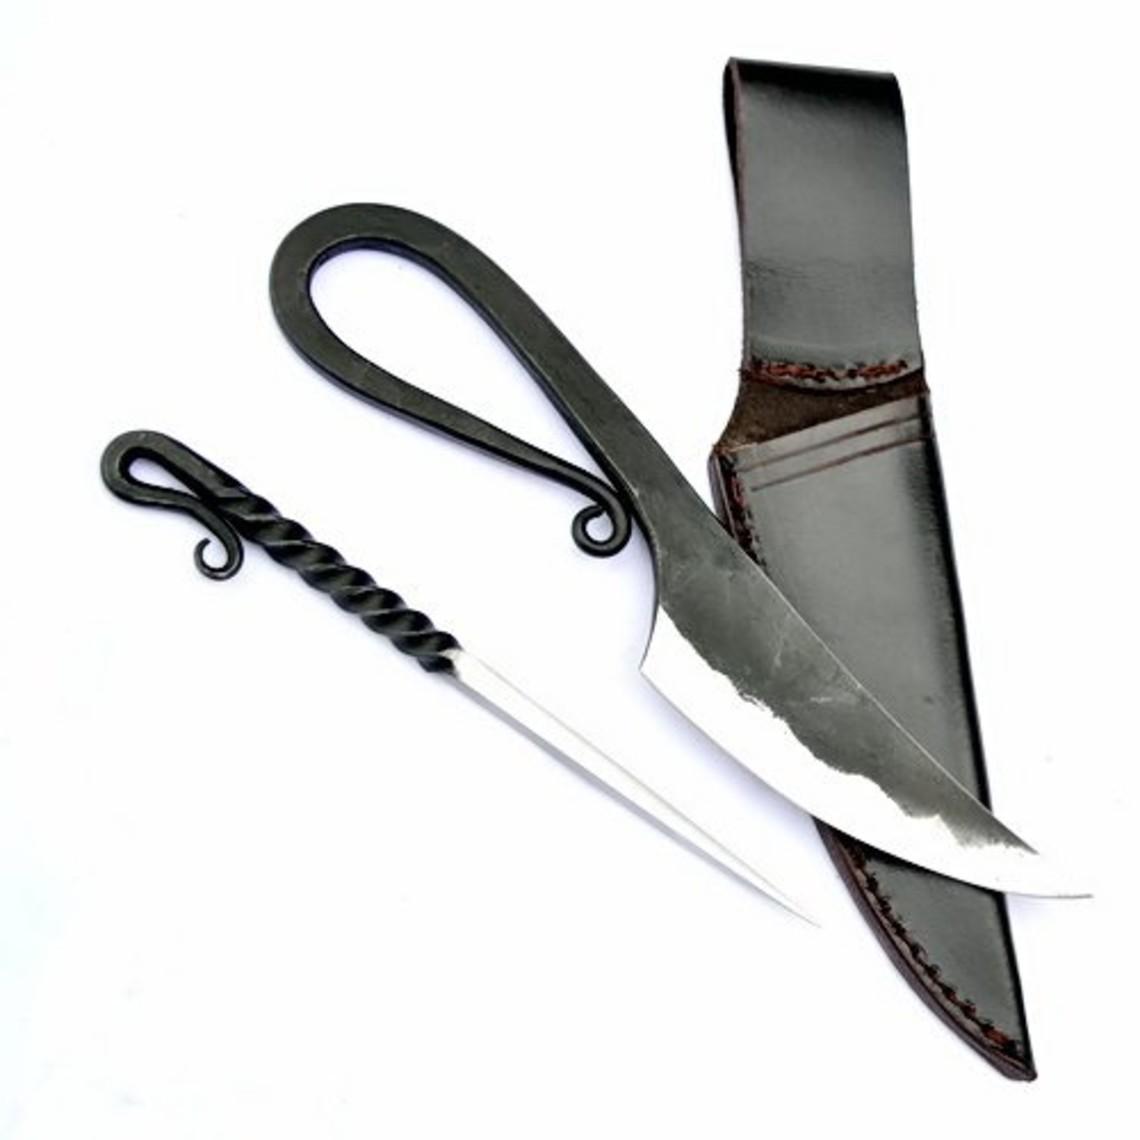 cuchillo germánico y comer selección